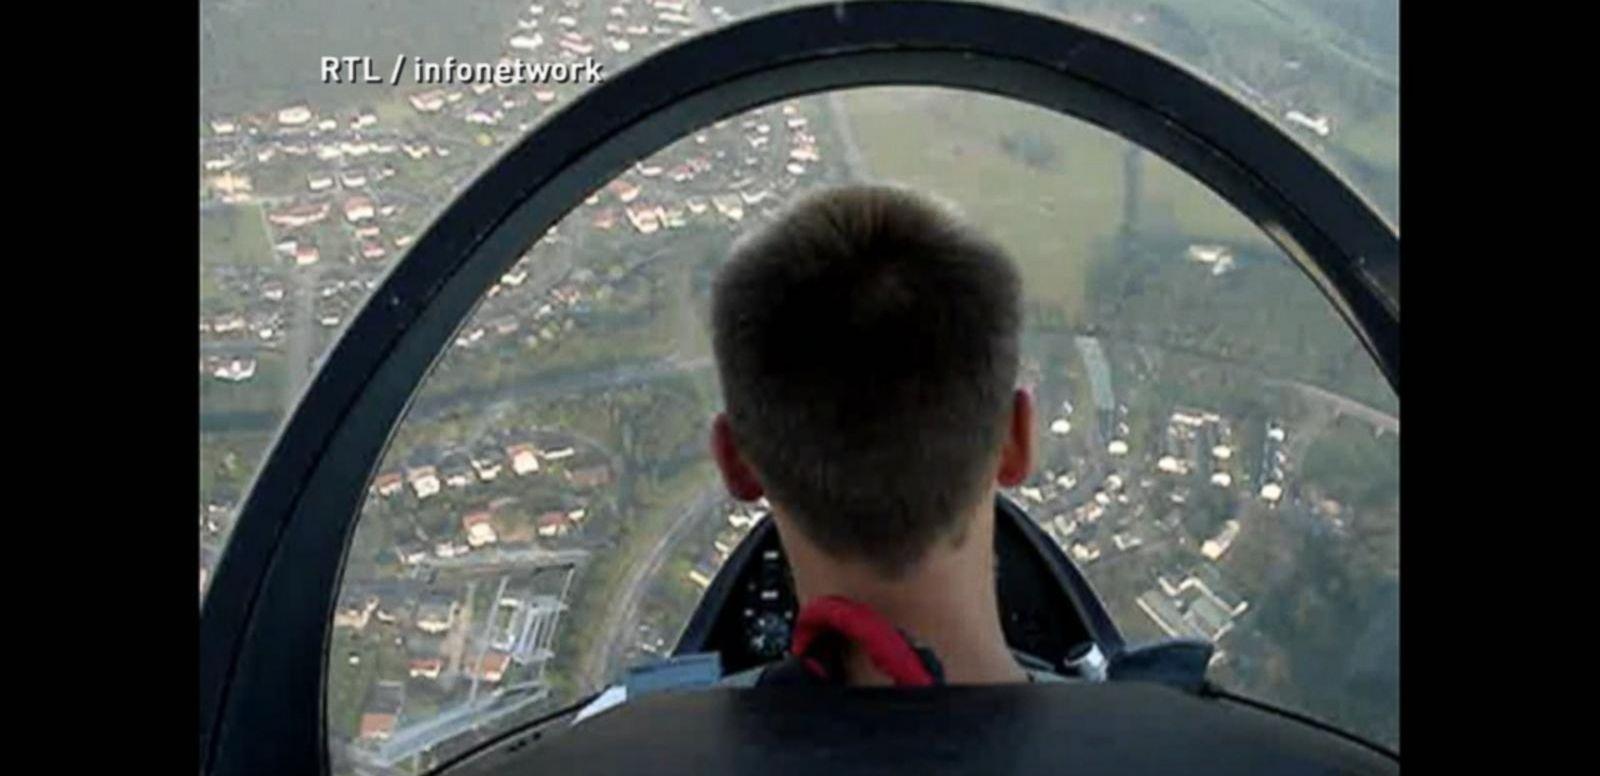 VIDEO: Cockpit Voice Recorder Reveals Horrific Last Moments of Germanwings Flight